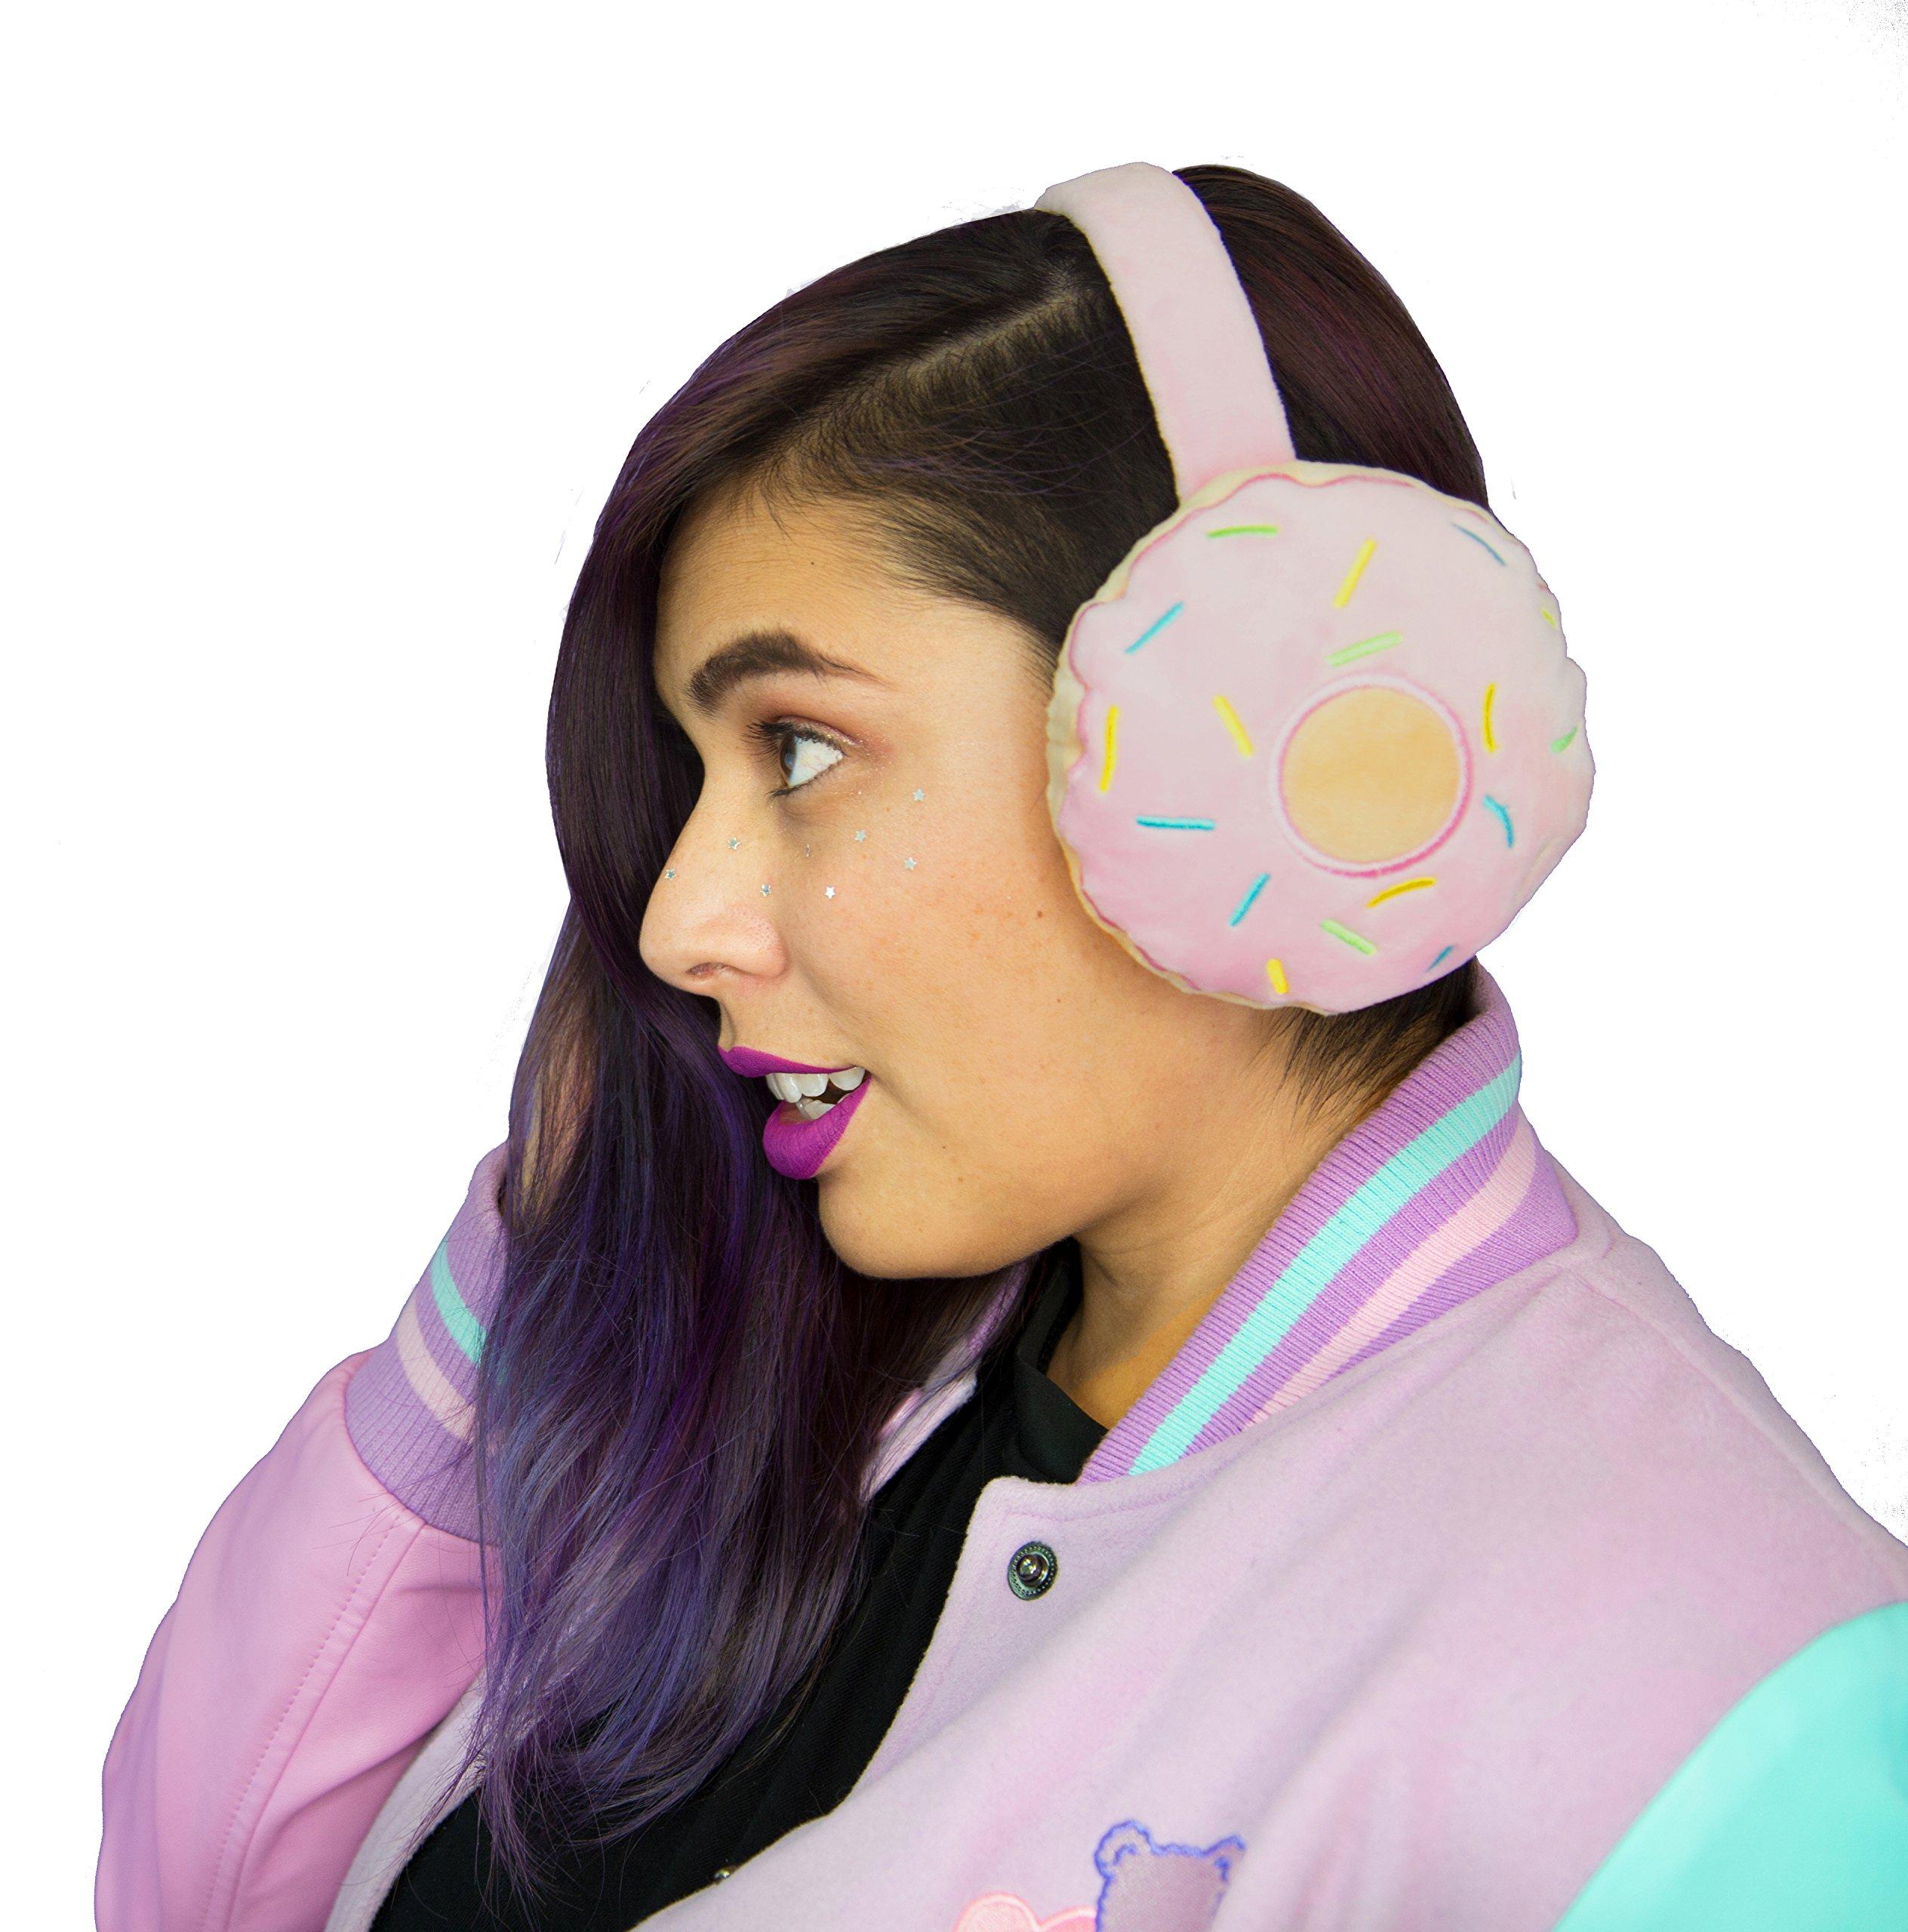 Earmuffs Foldable Donut Cute Pink Winter Fashion Accessory for women ladies girls - iHasCupquake